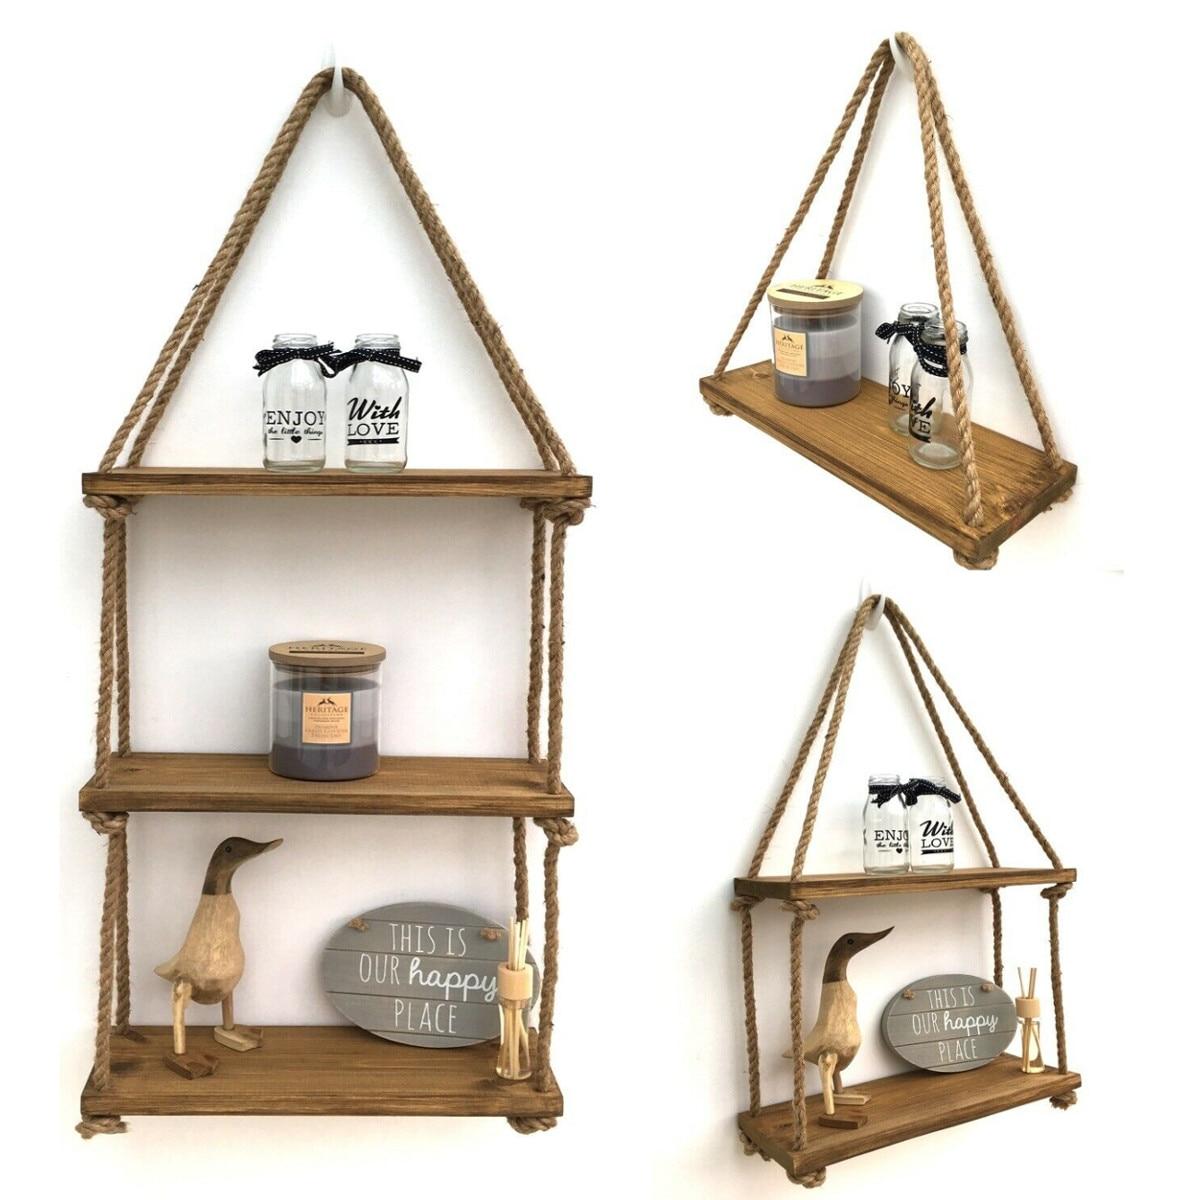 1/2/3 Tier Nordic Style Wooden Bead Tassels Storage Rack Wall Rope Hanging Shelf Decor Of Bedroom Living Room Kitchen Office New|Storage Holders & Racks| |  - title=